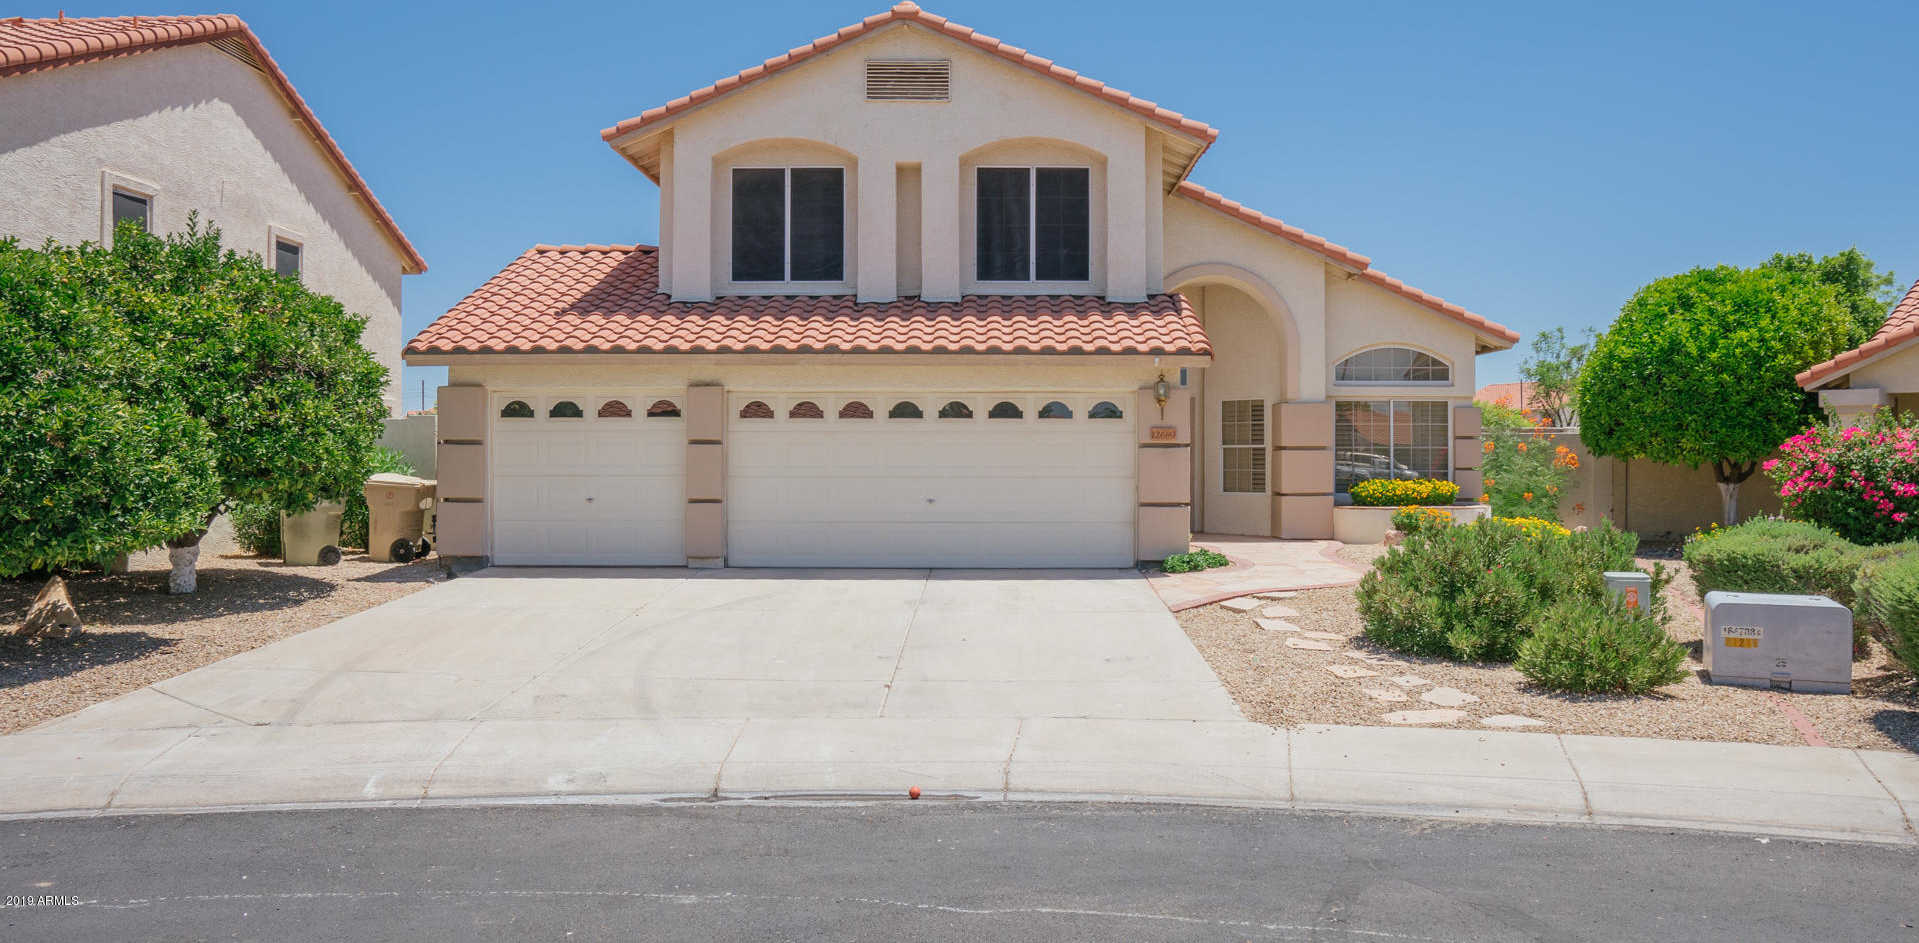 $340,000 - 4Br/3Ba - Home for Sale in Mission Groves 4 & 5, Glendale